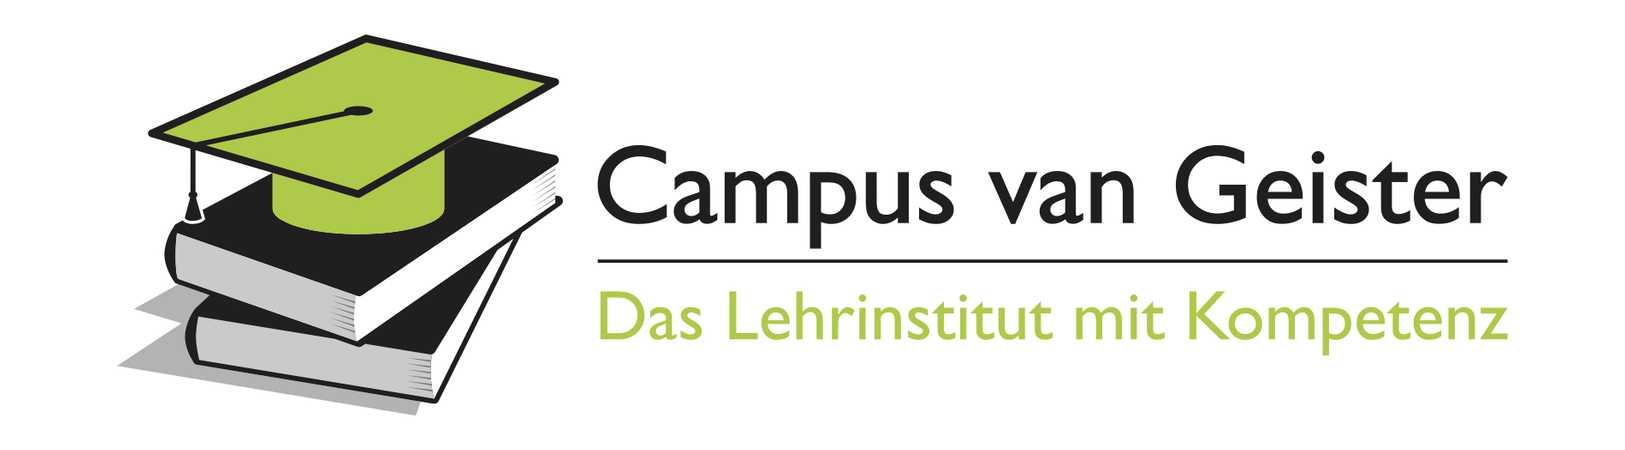 Campus van Geister